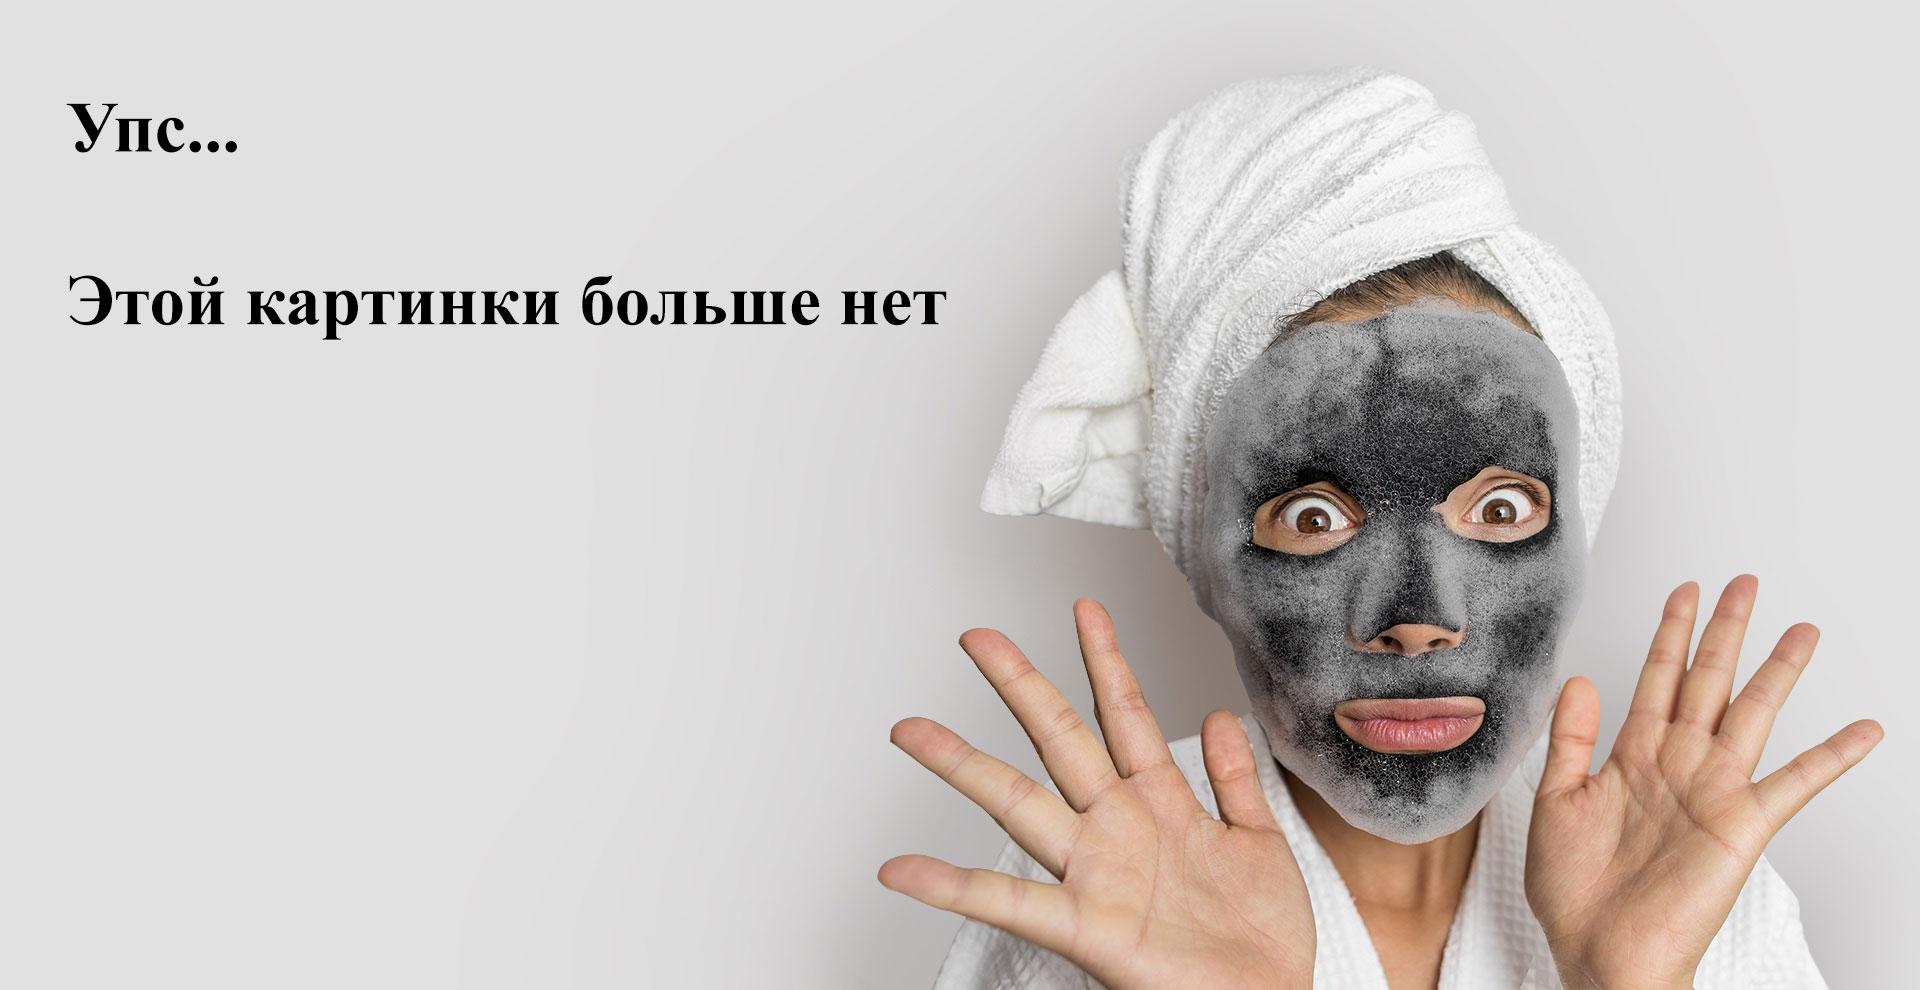 Estel, Оксигент 6% De Luxe, для окрашивания волос, 60 мл